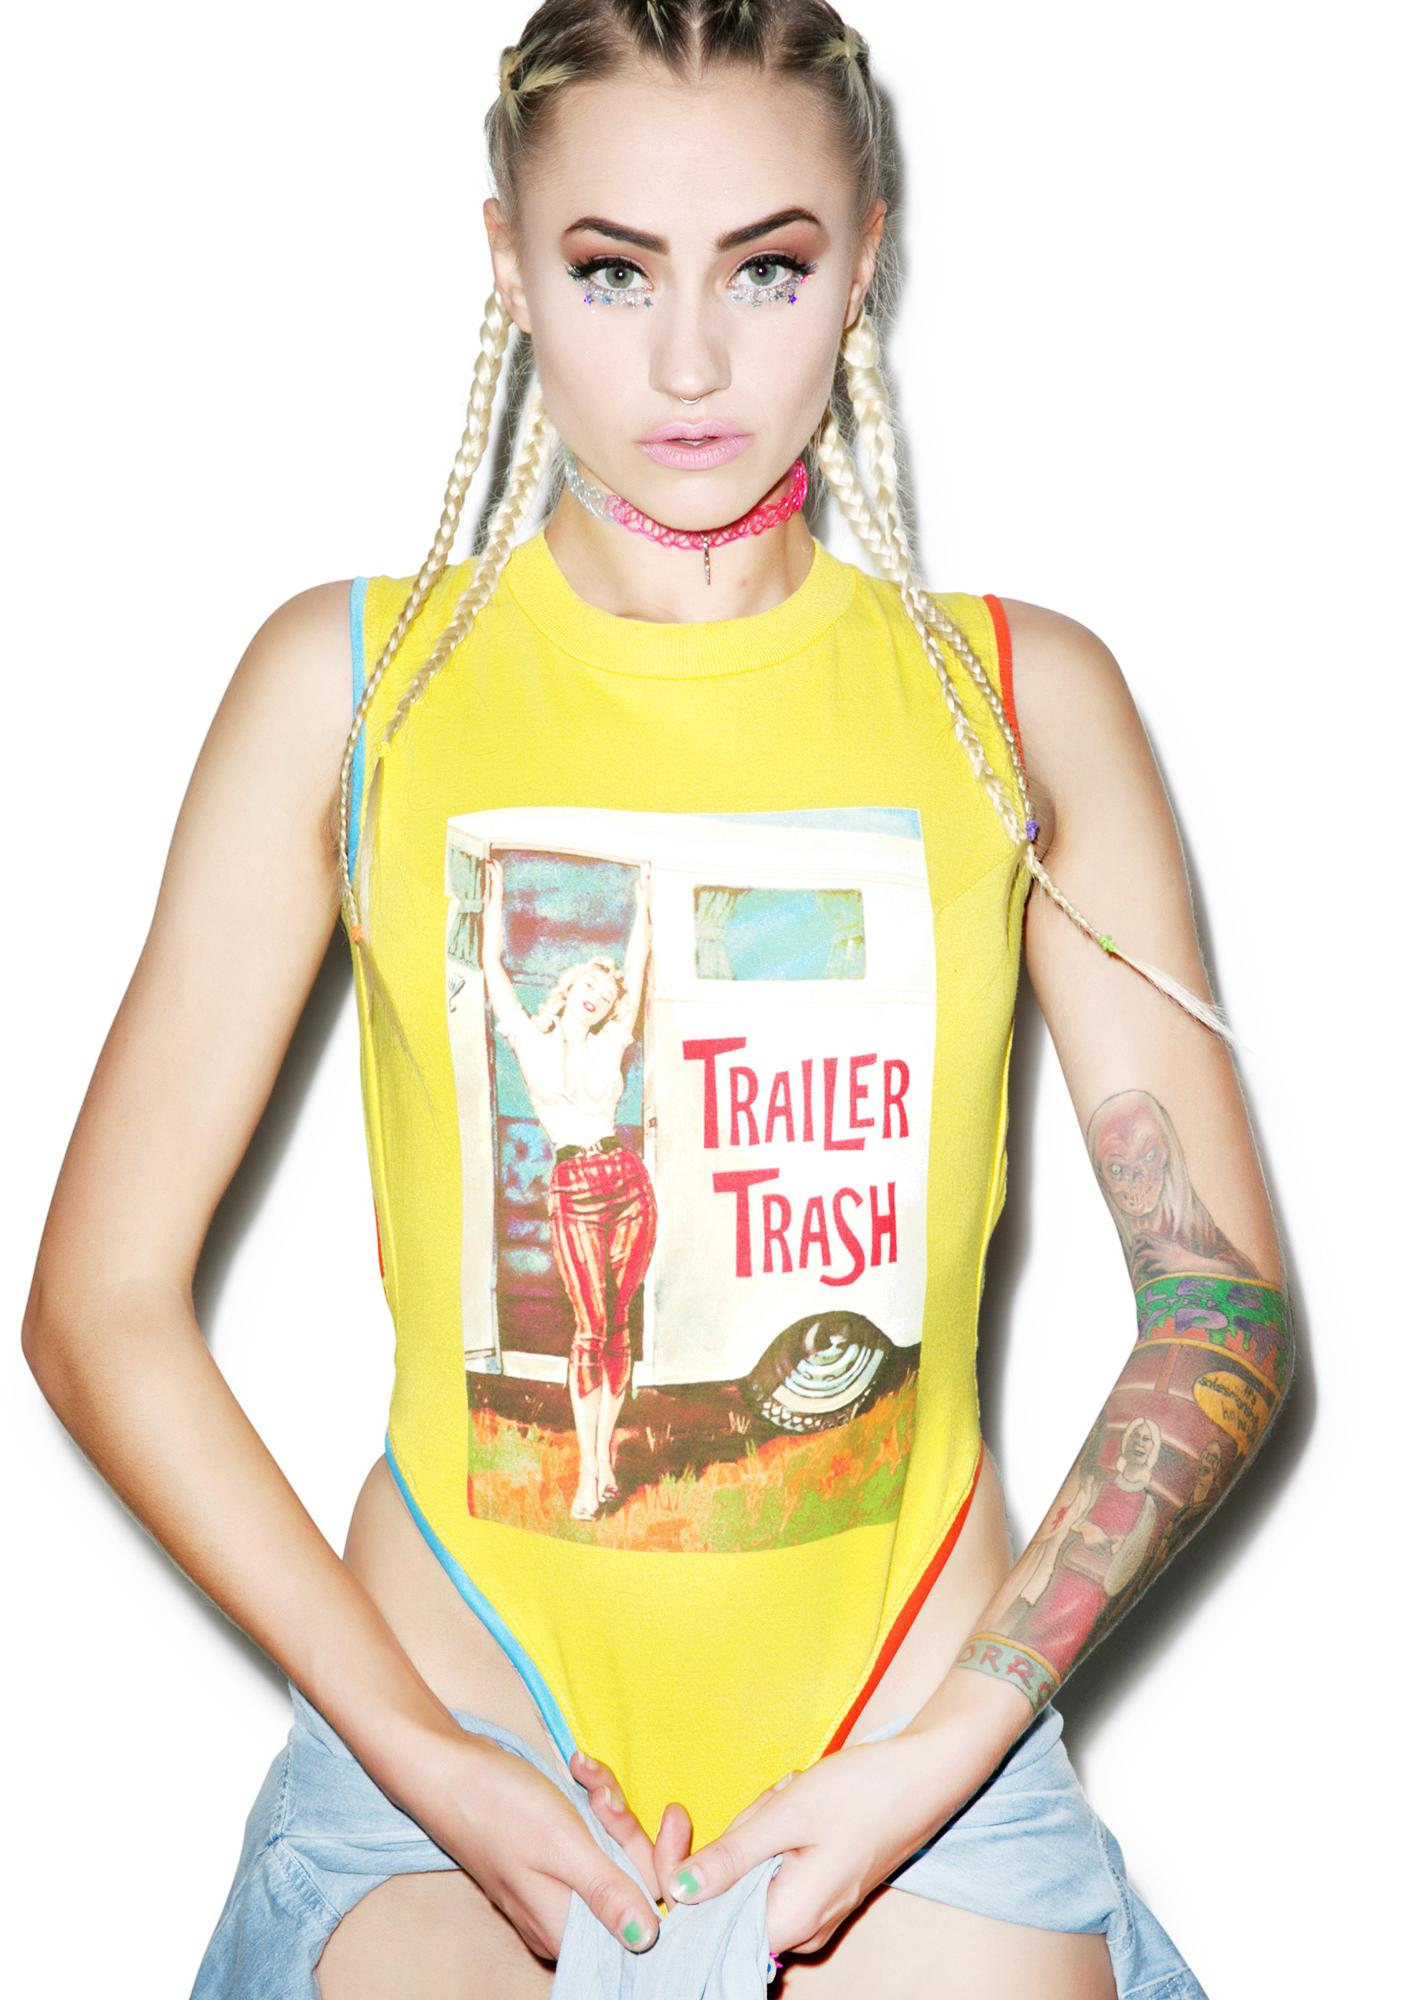 Mamadoux Trailer Trash Bodysuit